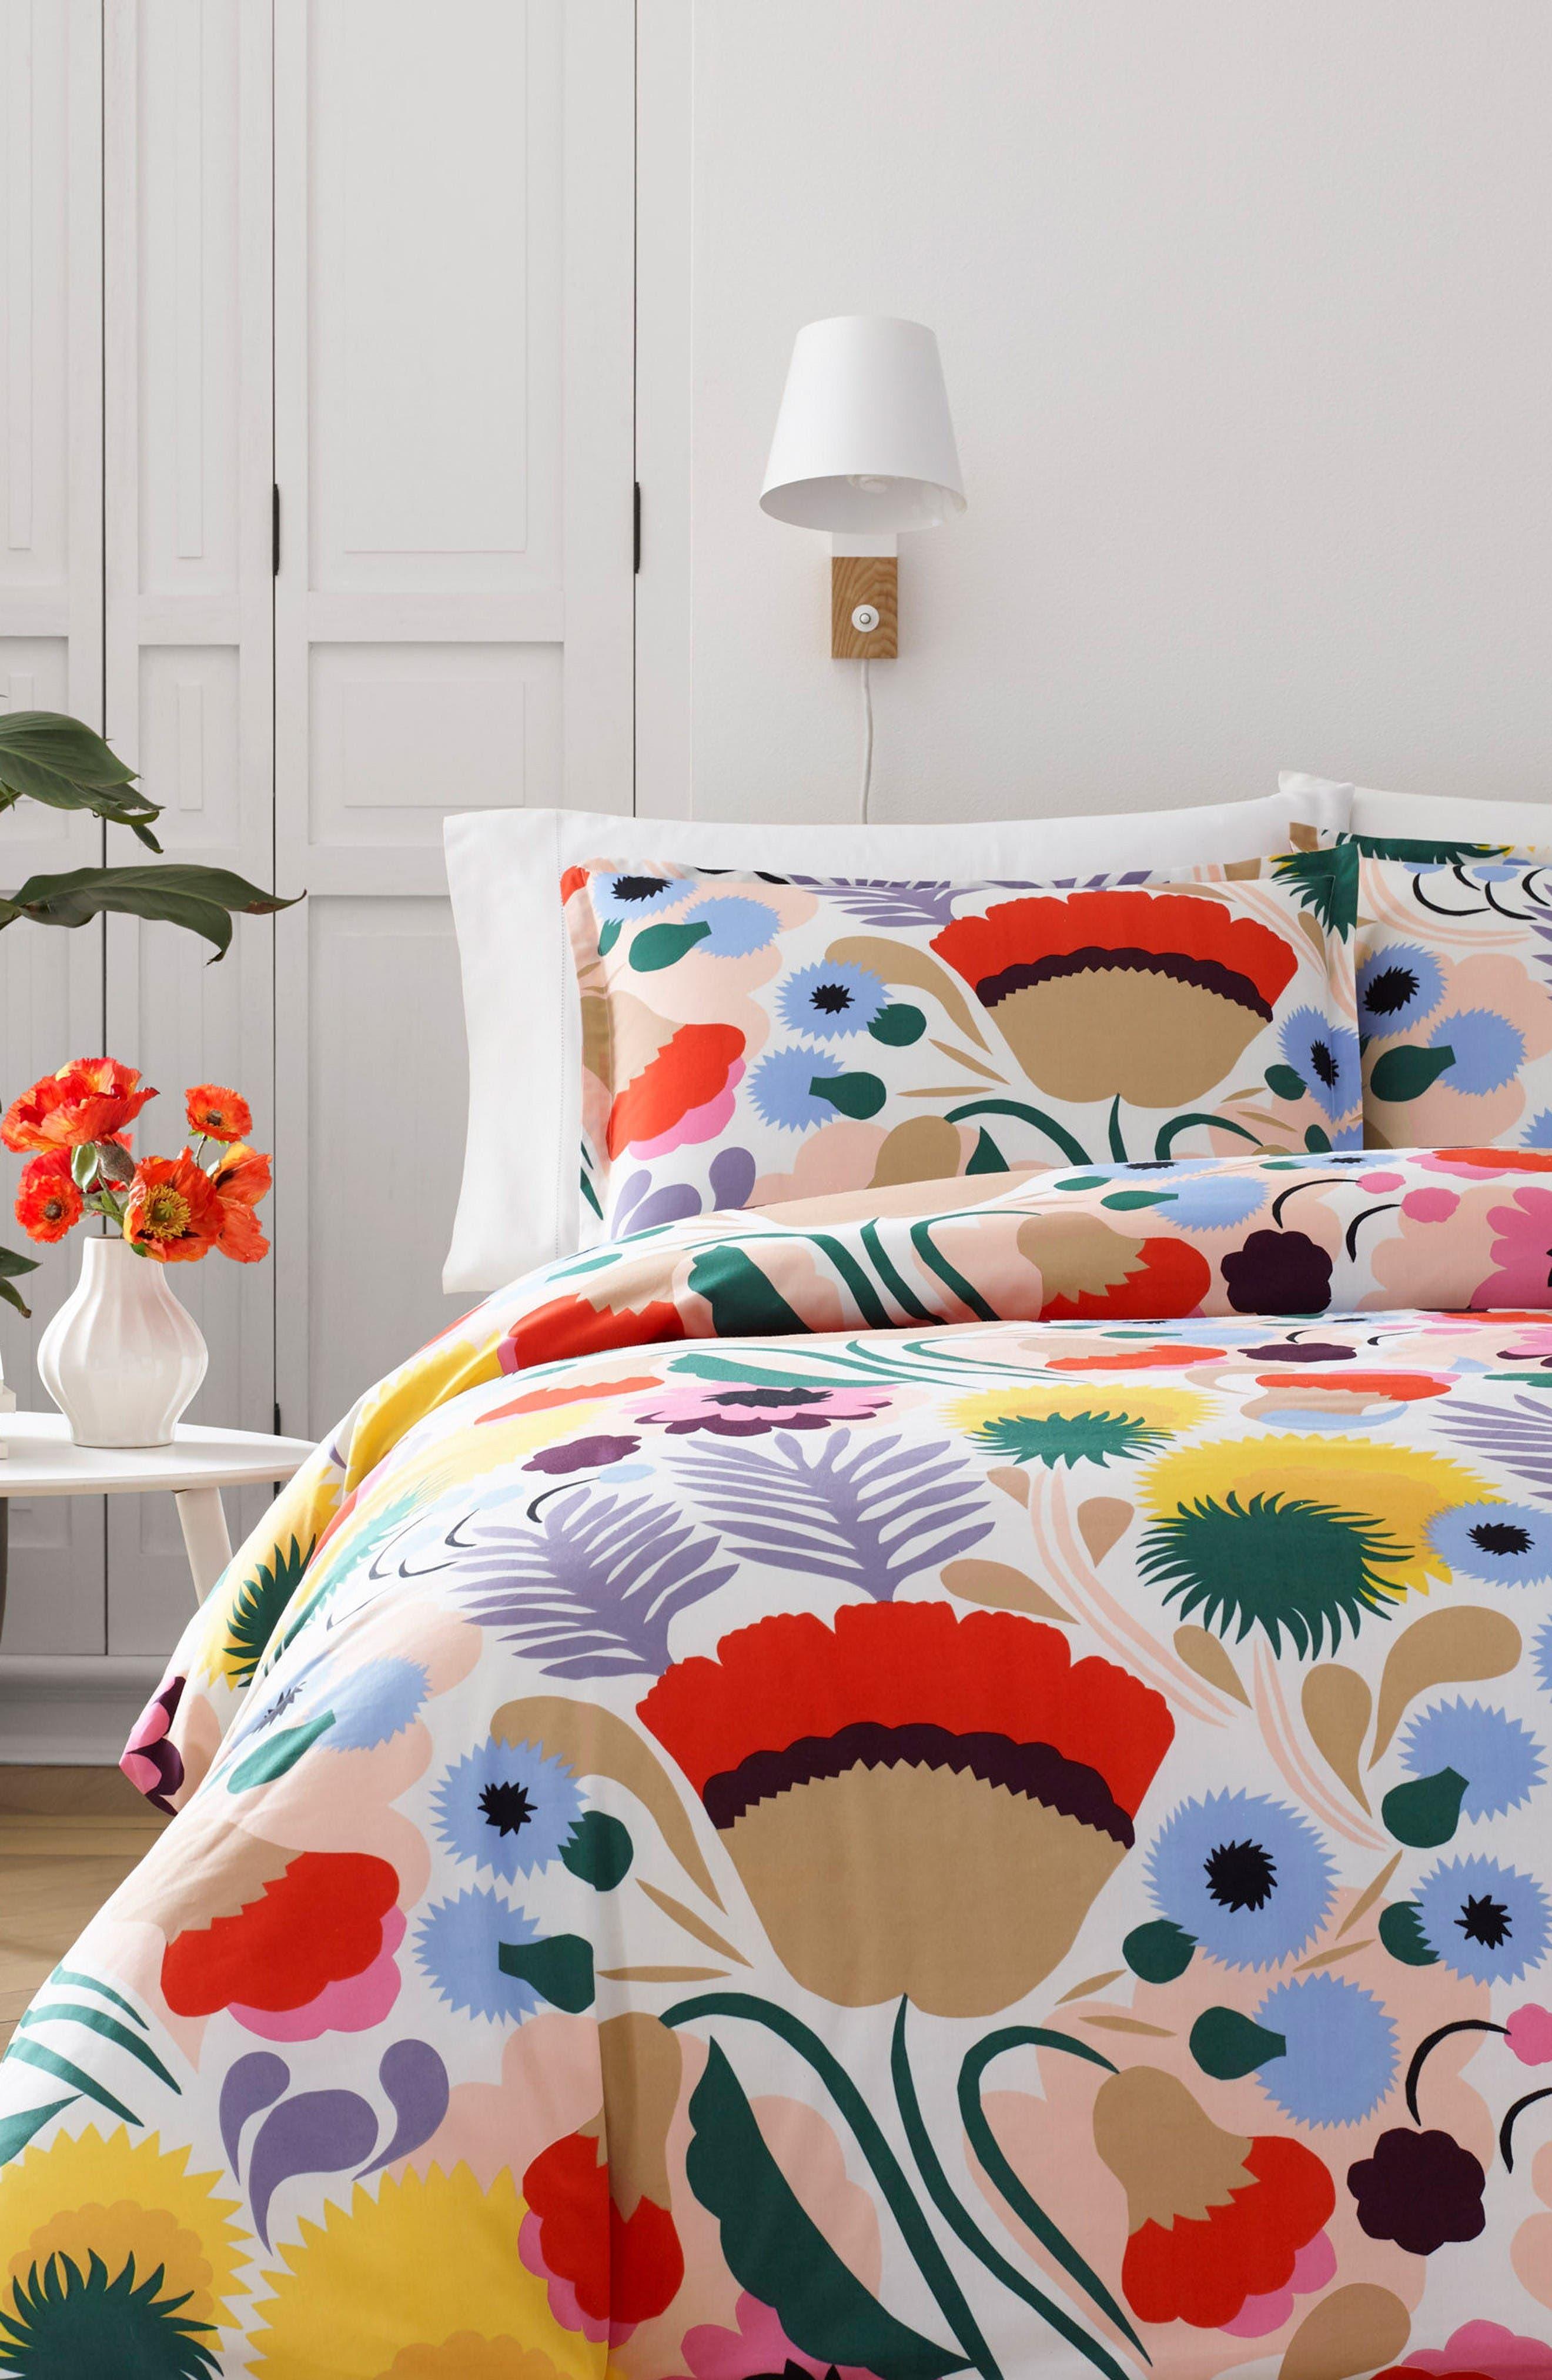 Marimekko Ojakellukka Comforter & Sham Set